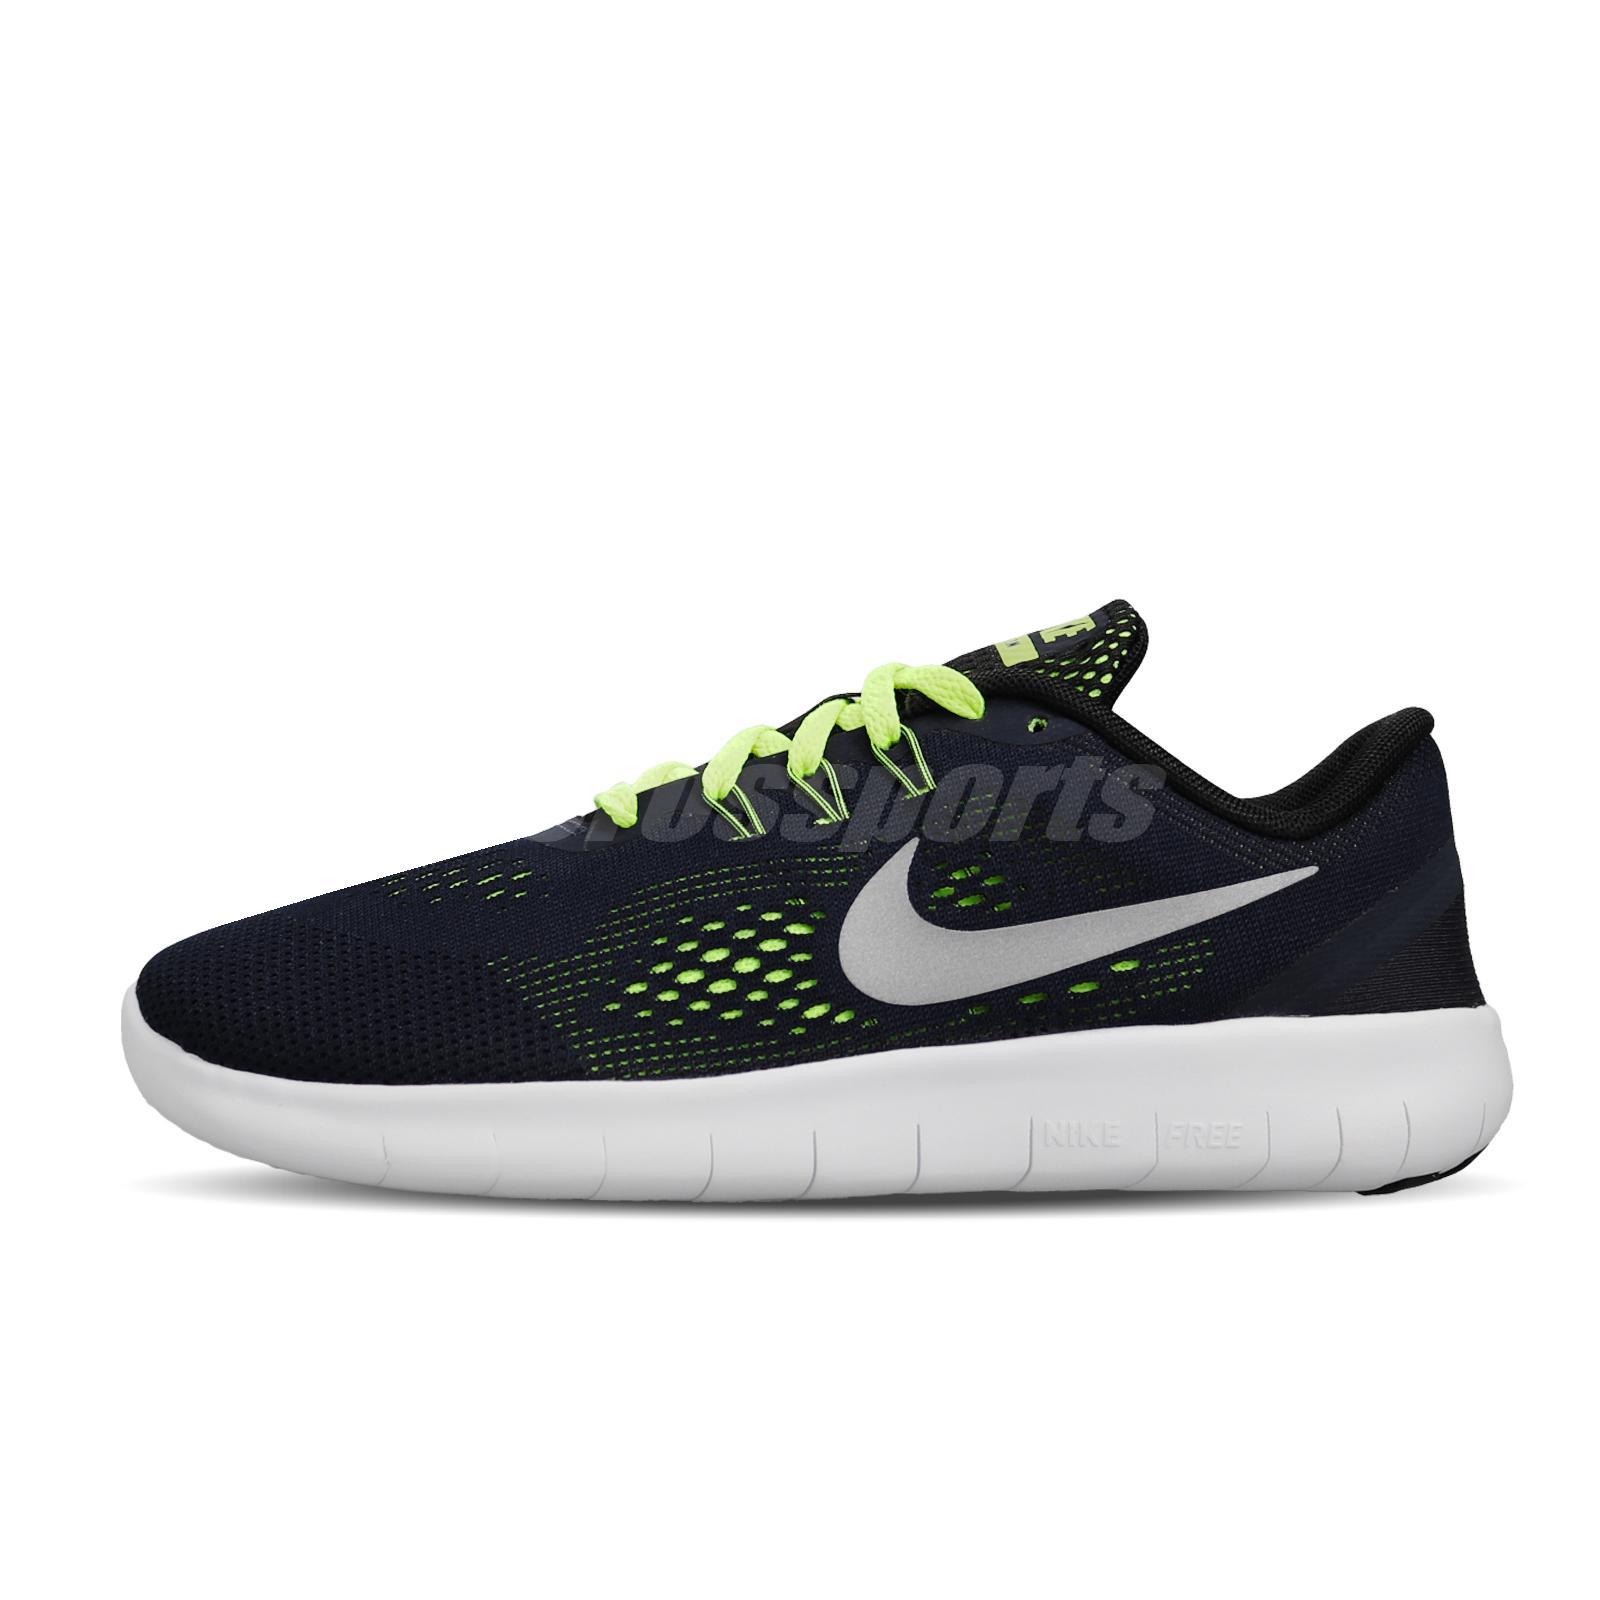 51fafbbc6a8 ... top quality nike free rn gs running kids womens shoes obsidian blue  833989 403 ddecf ef46b ...